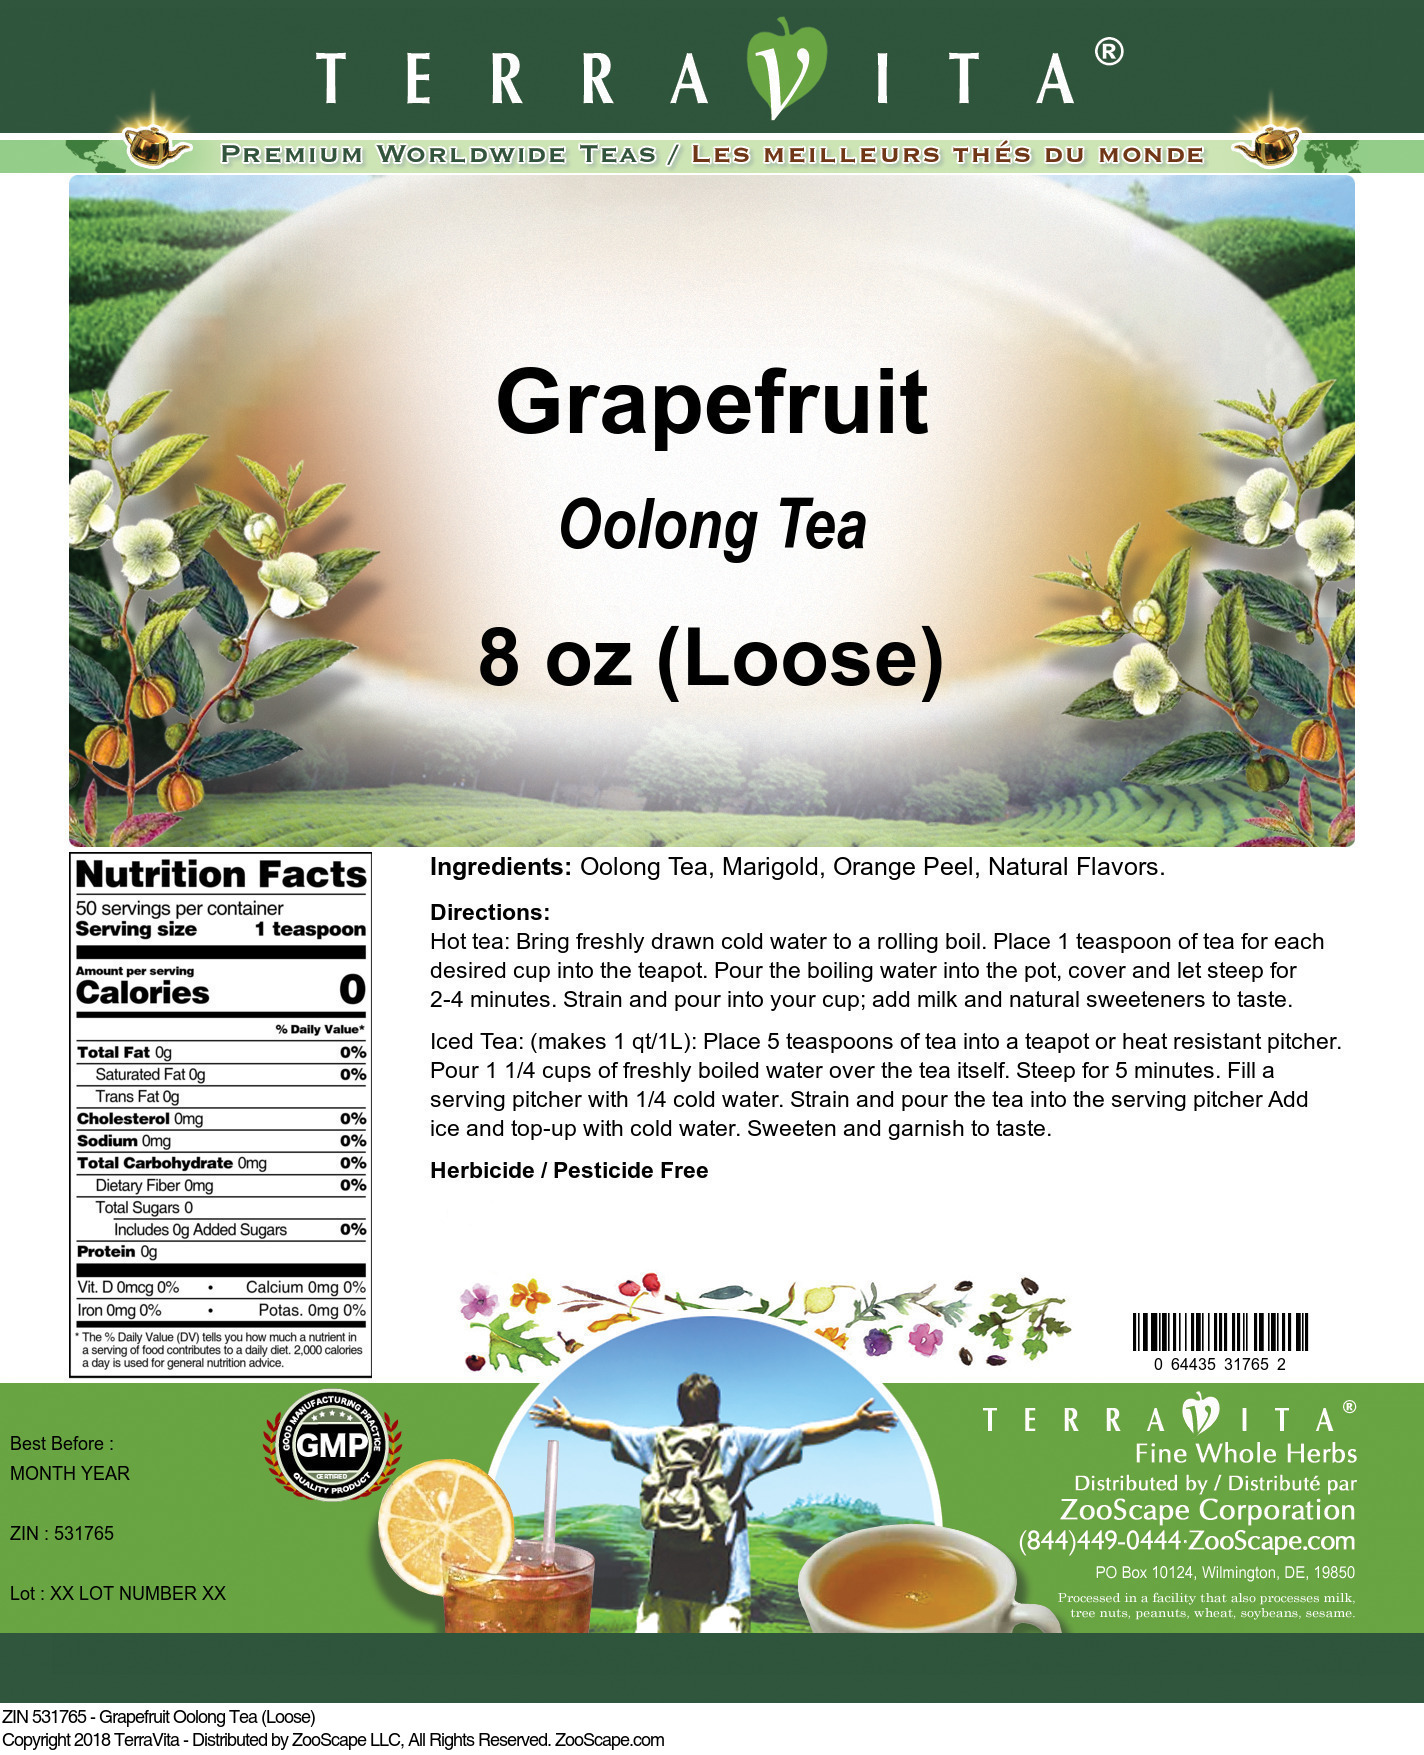 Grapefruit Oolong Tea (Loose)